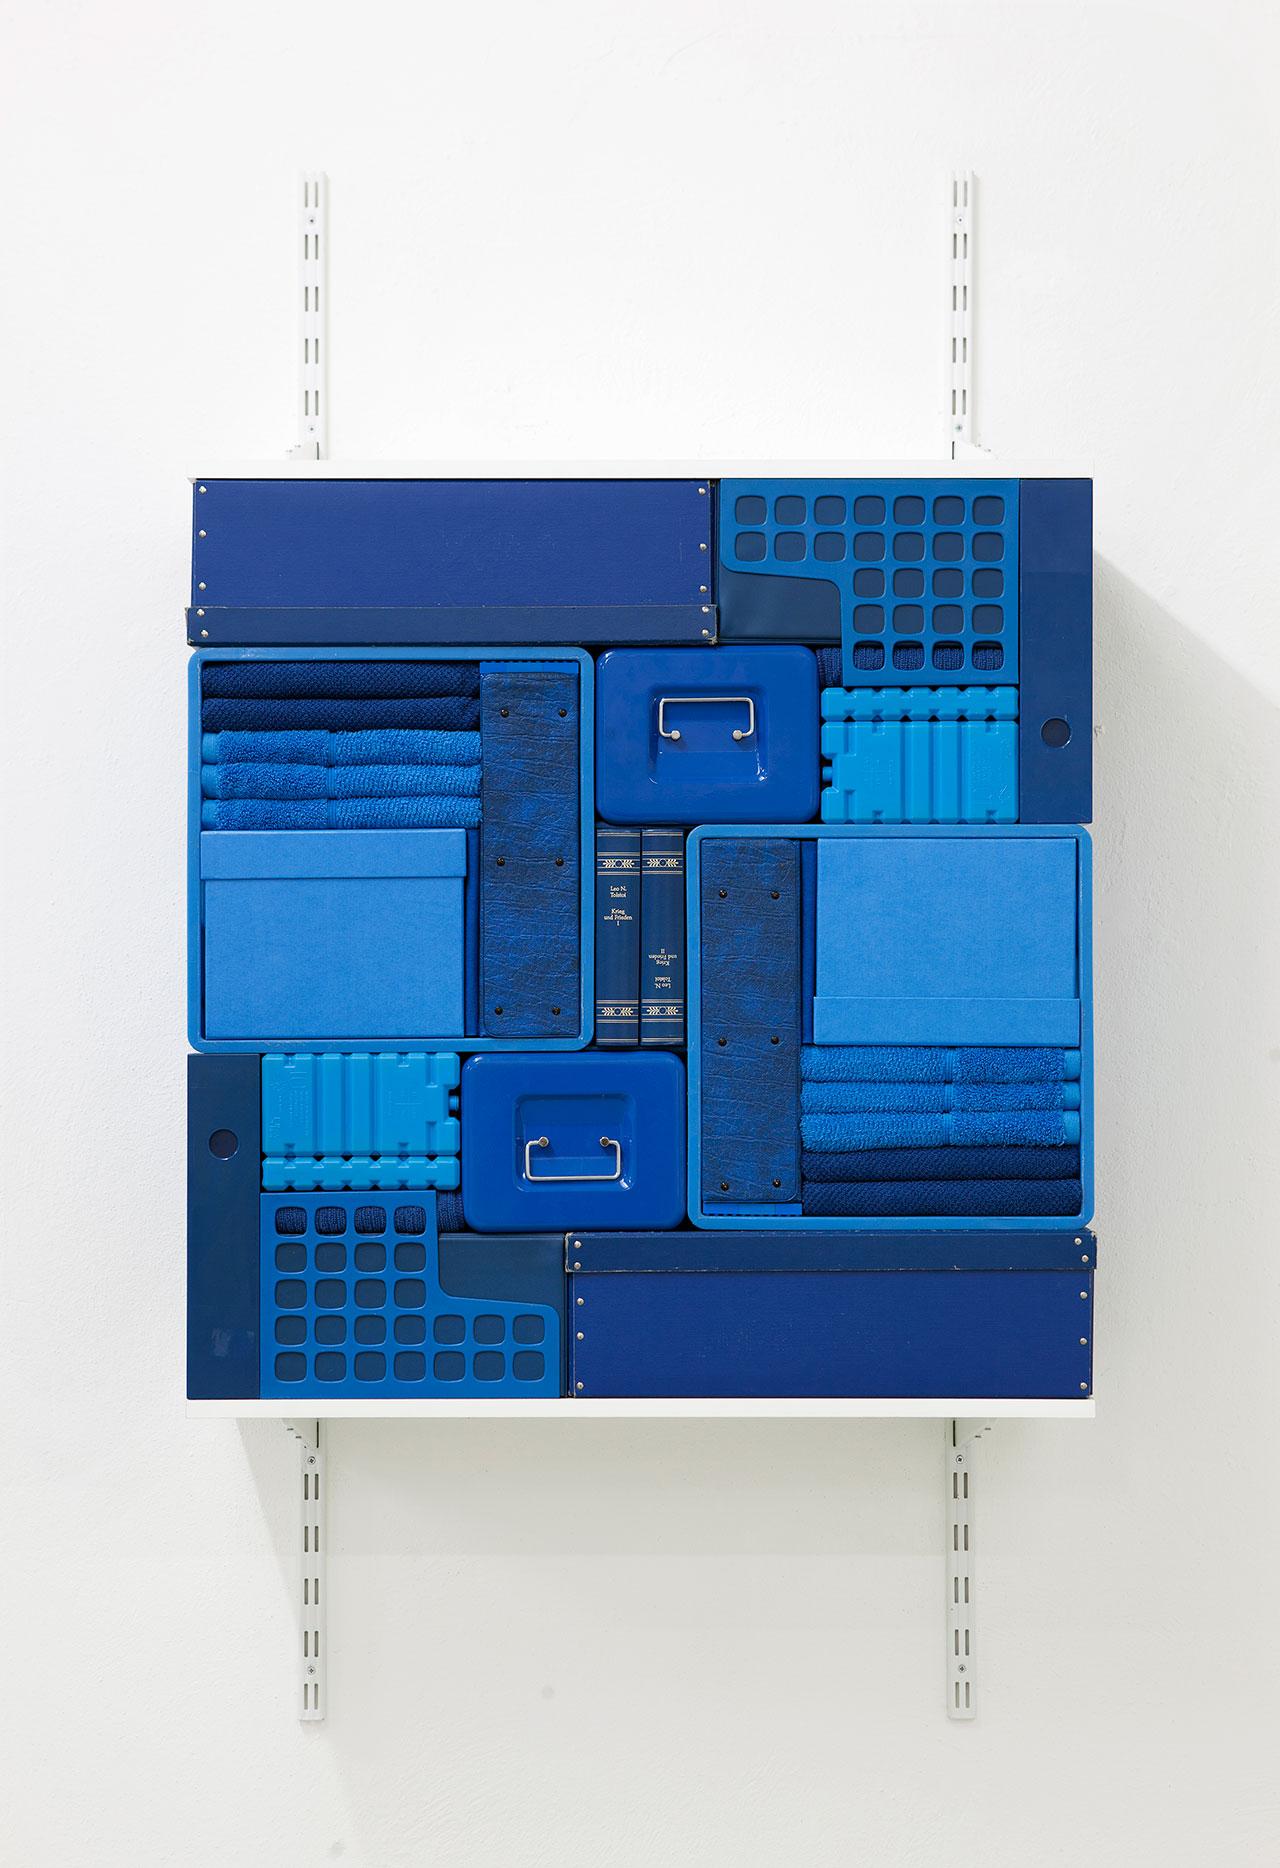 Michael Johansson,Flip Shelf(blue), 2018, blue ordinary items, shelfs,149,5x80x31 cm. Courtesy: The Flat – Massimo Carasi, Milan. Photo © Michael Johansson.